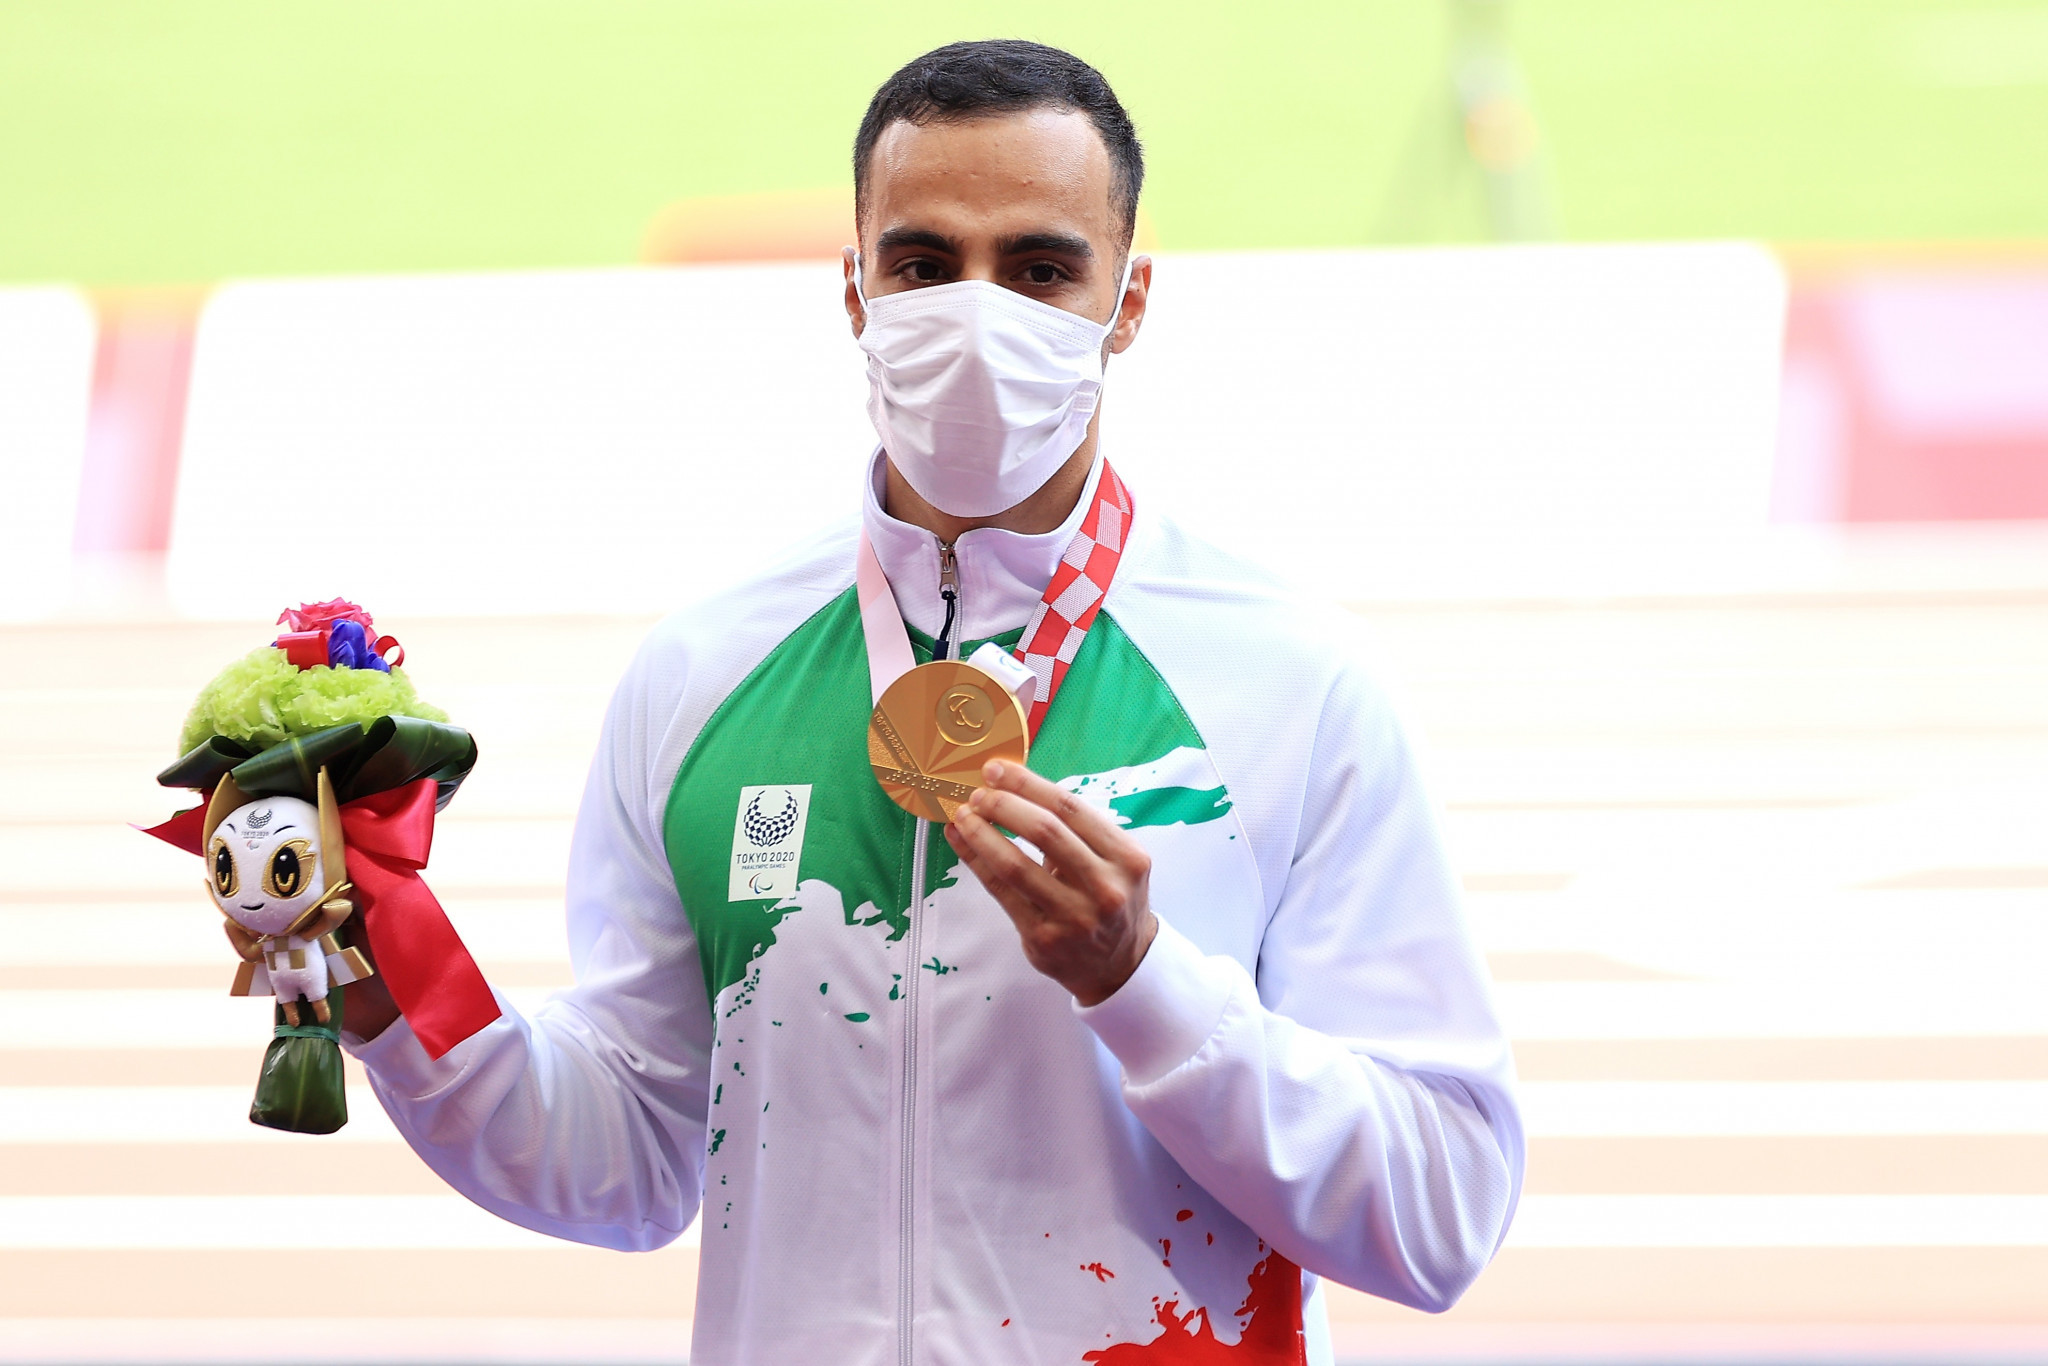 Long jumper Amir Khosravani was among Iranian 12 gold medallists at the Tokyo 2020 Paralympics ©Getty Images